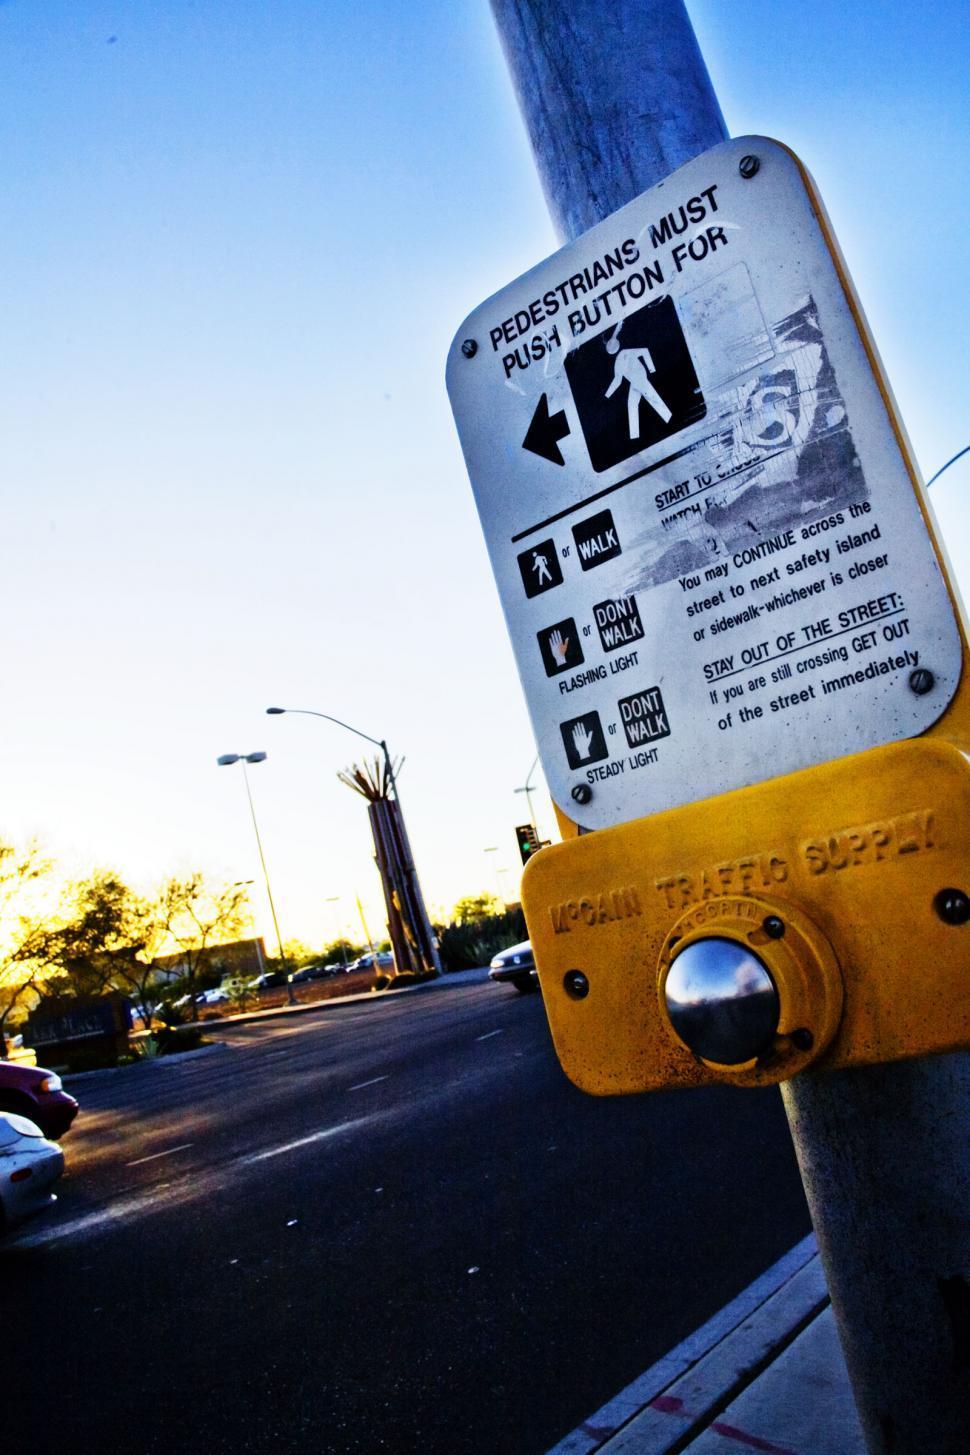 Download Free Stock Photo of Grainy crosswalk sign